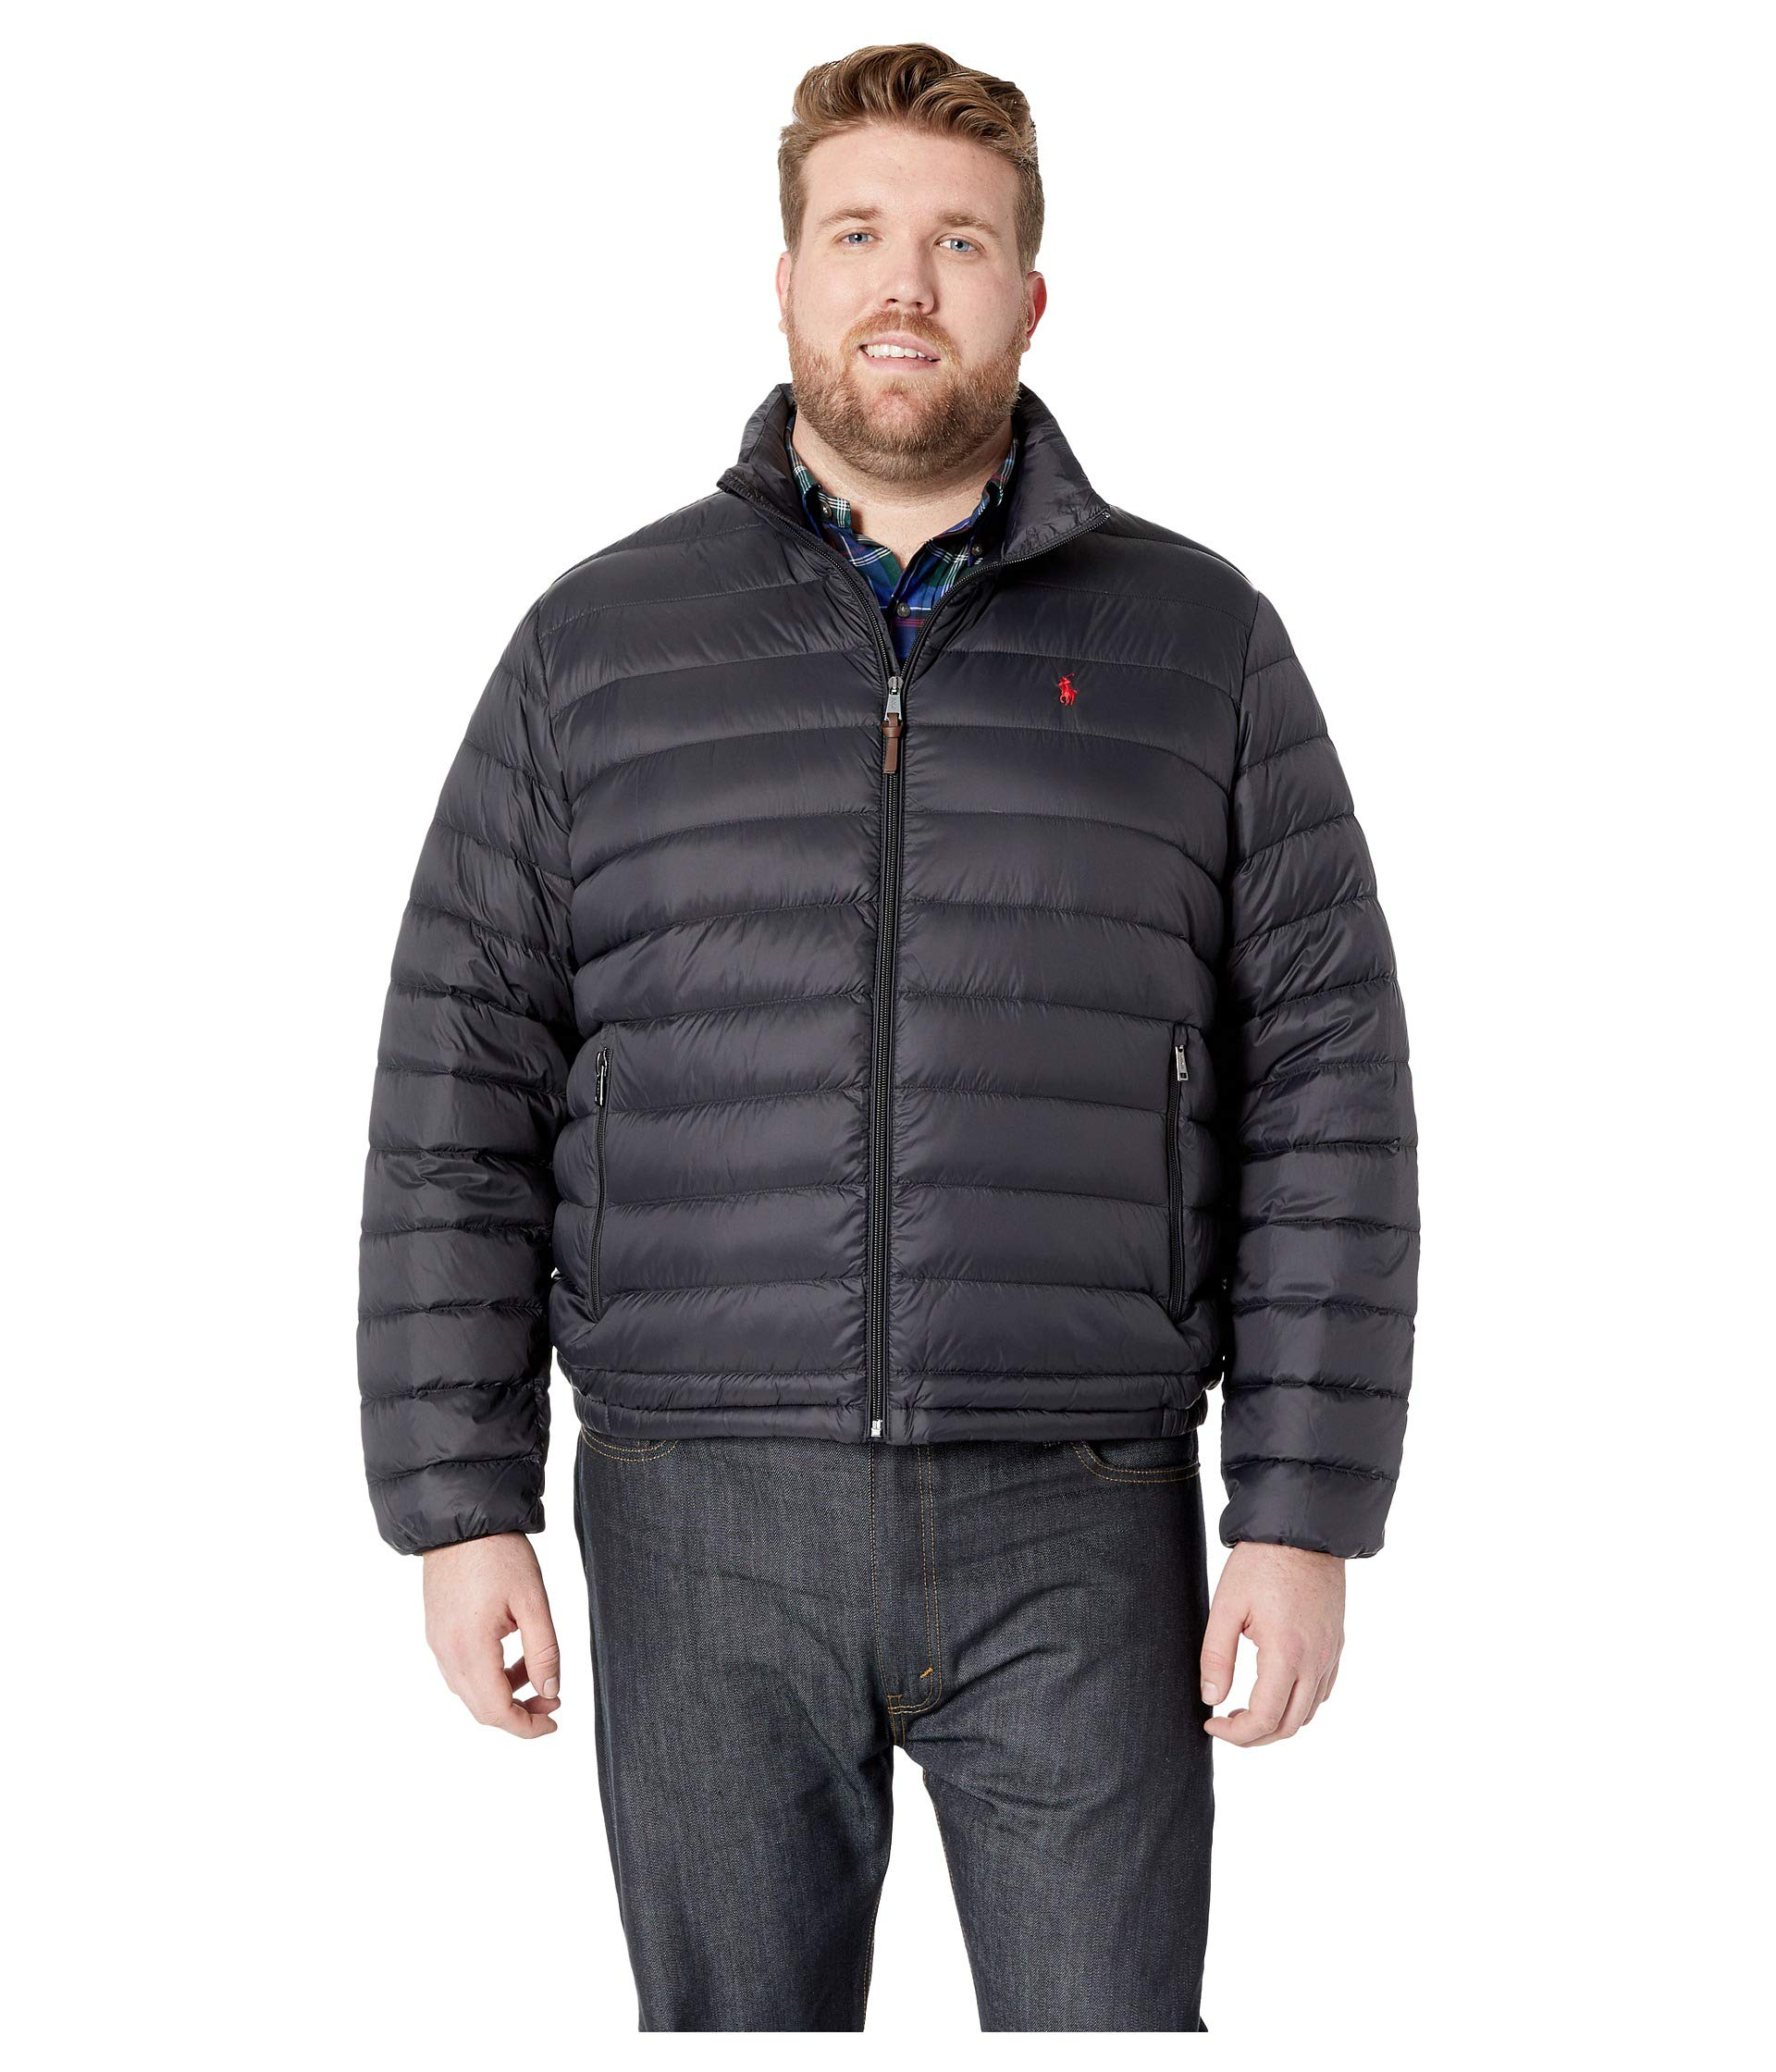 Lauren Black Down Jacket Polo amp; Packable Lightweight Tall Ralph Big HWa5Wz